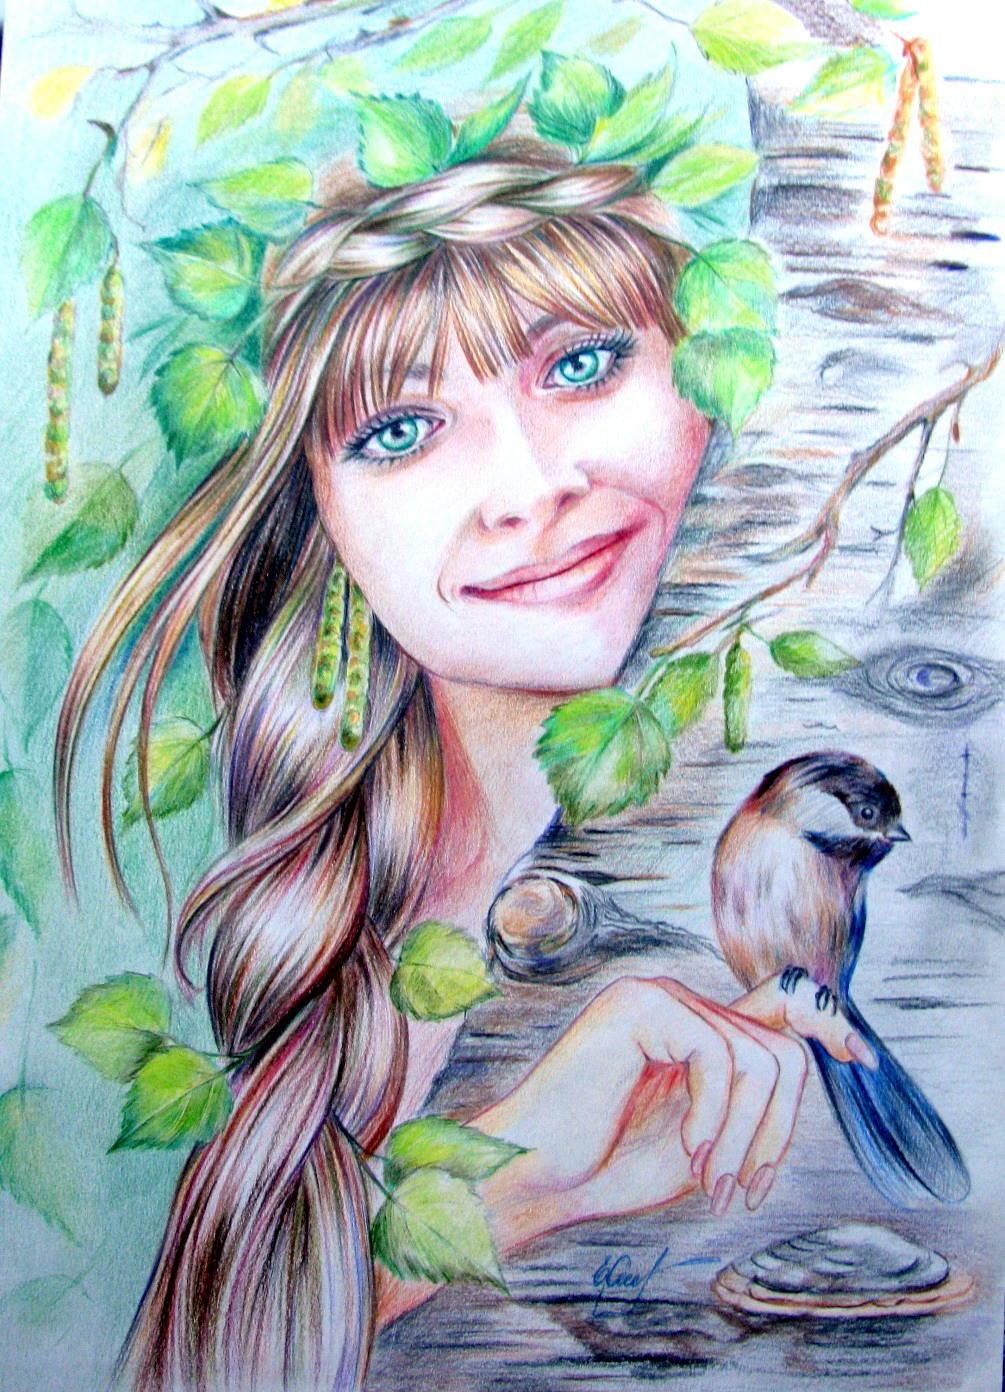 Девушка Весна, техника смешанная (пастель, акв. карандаши)